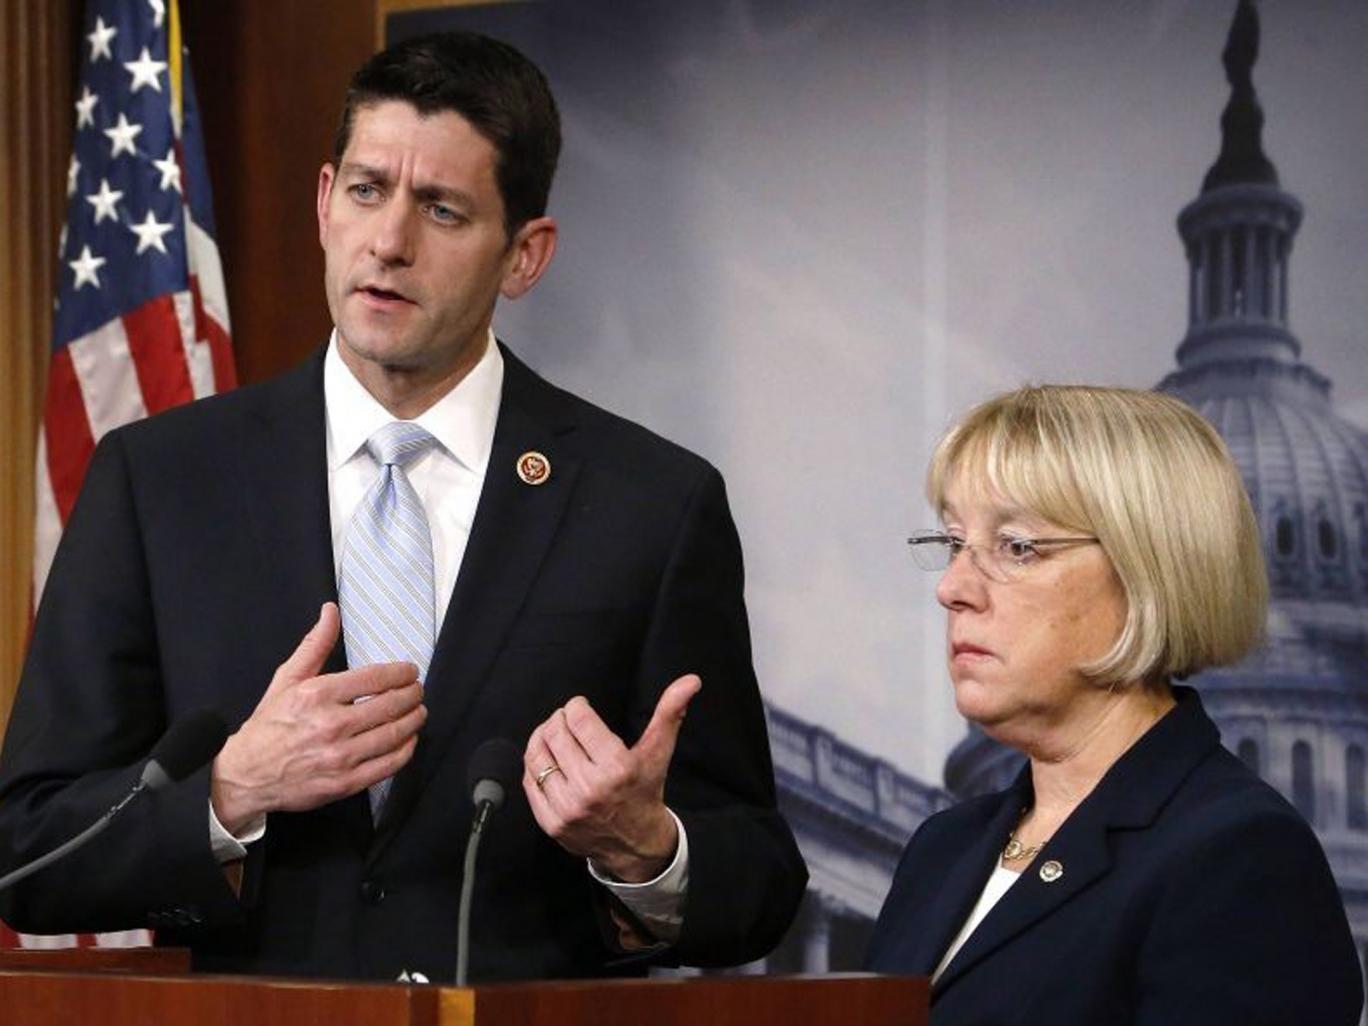 House Budget Committee chairman Representative Paul Ryan and Senate Budget Committee chairman Senator Patty Murray